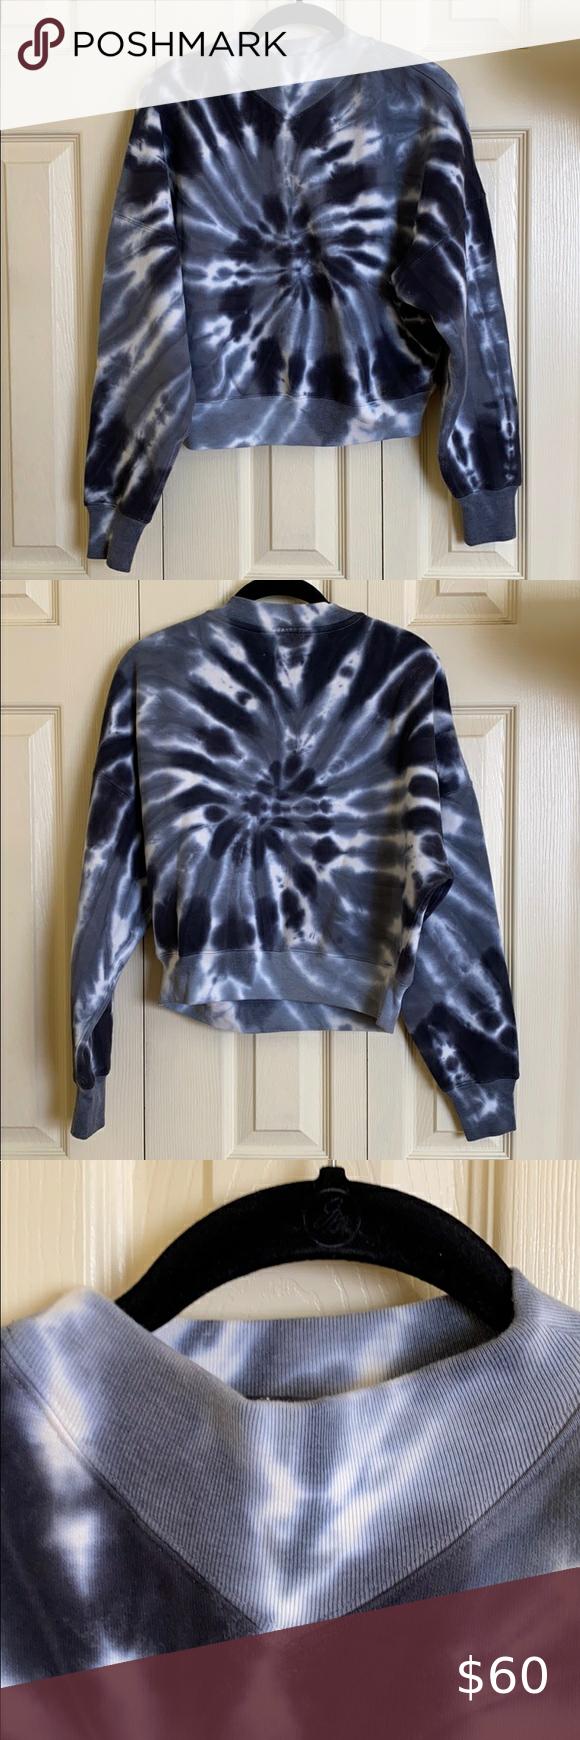 Aritzia Wilfred Free Katy Sweater Cropped Wool Sweater Tie Dye Sweater Jeans And Sneakers [ 1740 x 580 Pixel ]